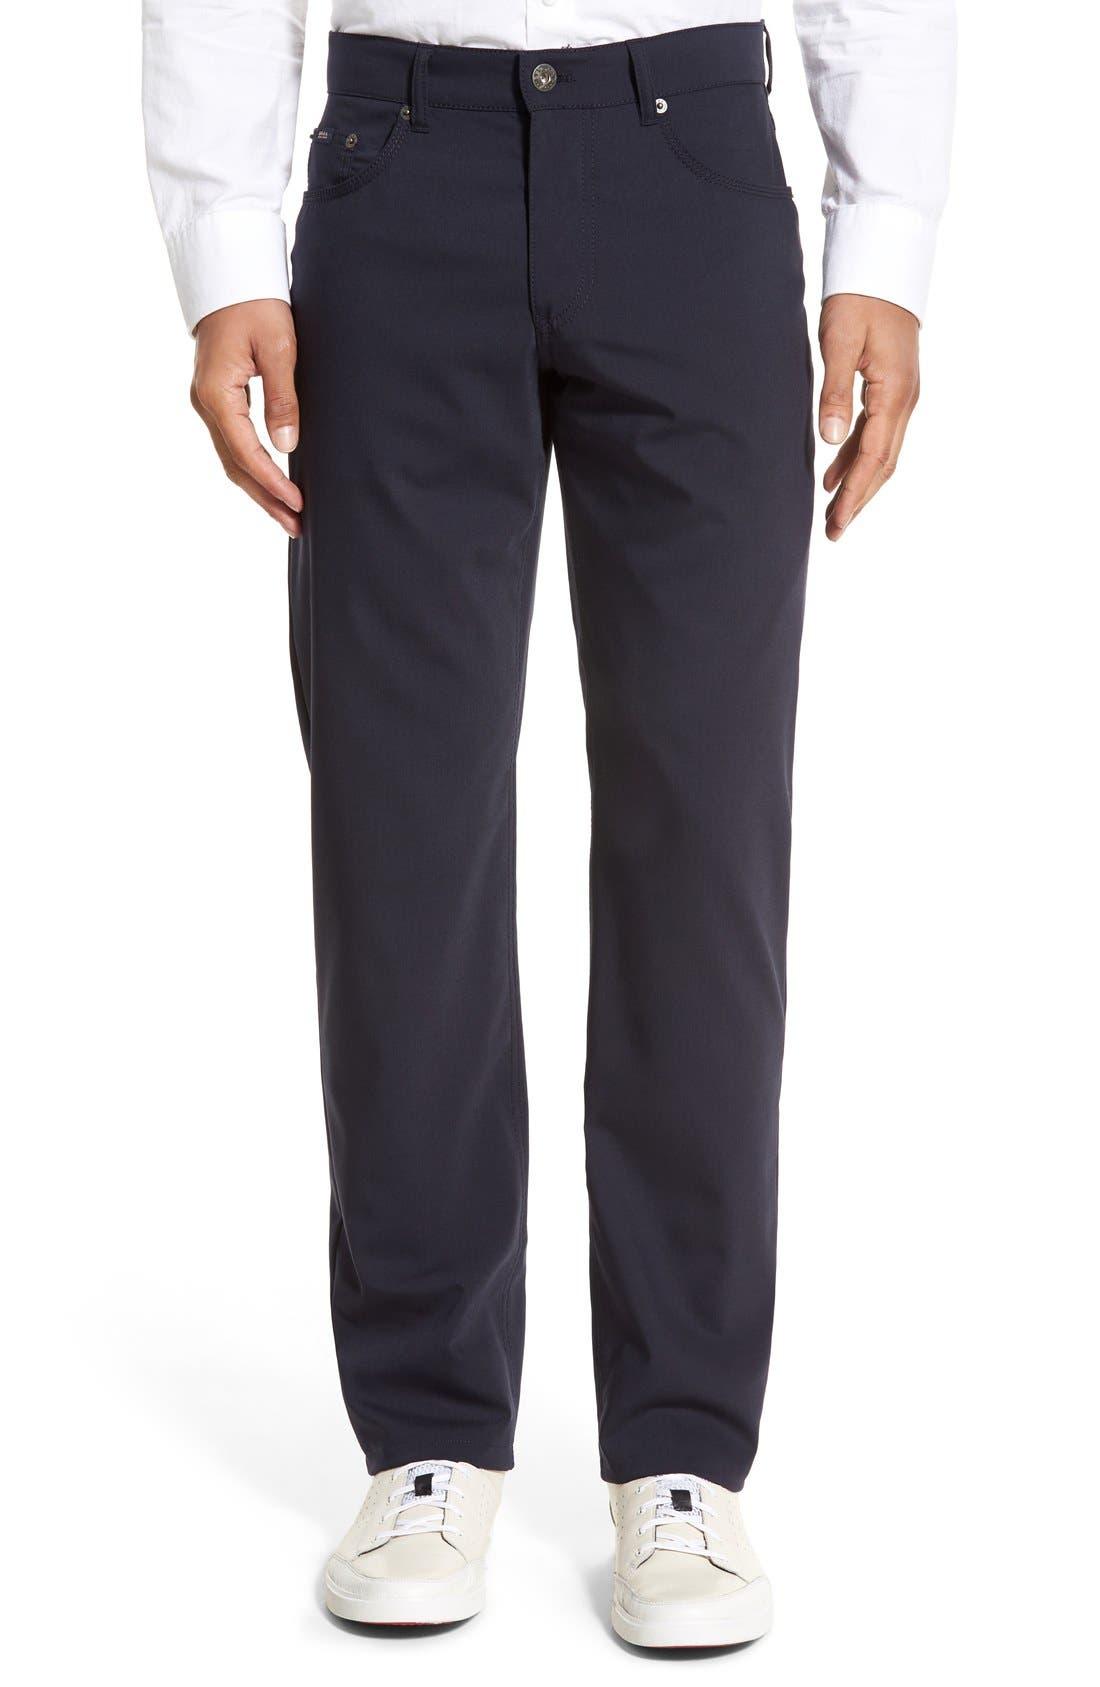 Brax 'Manager' Five-Pocket Wool Pants